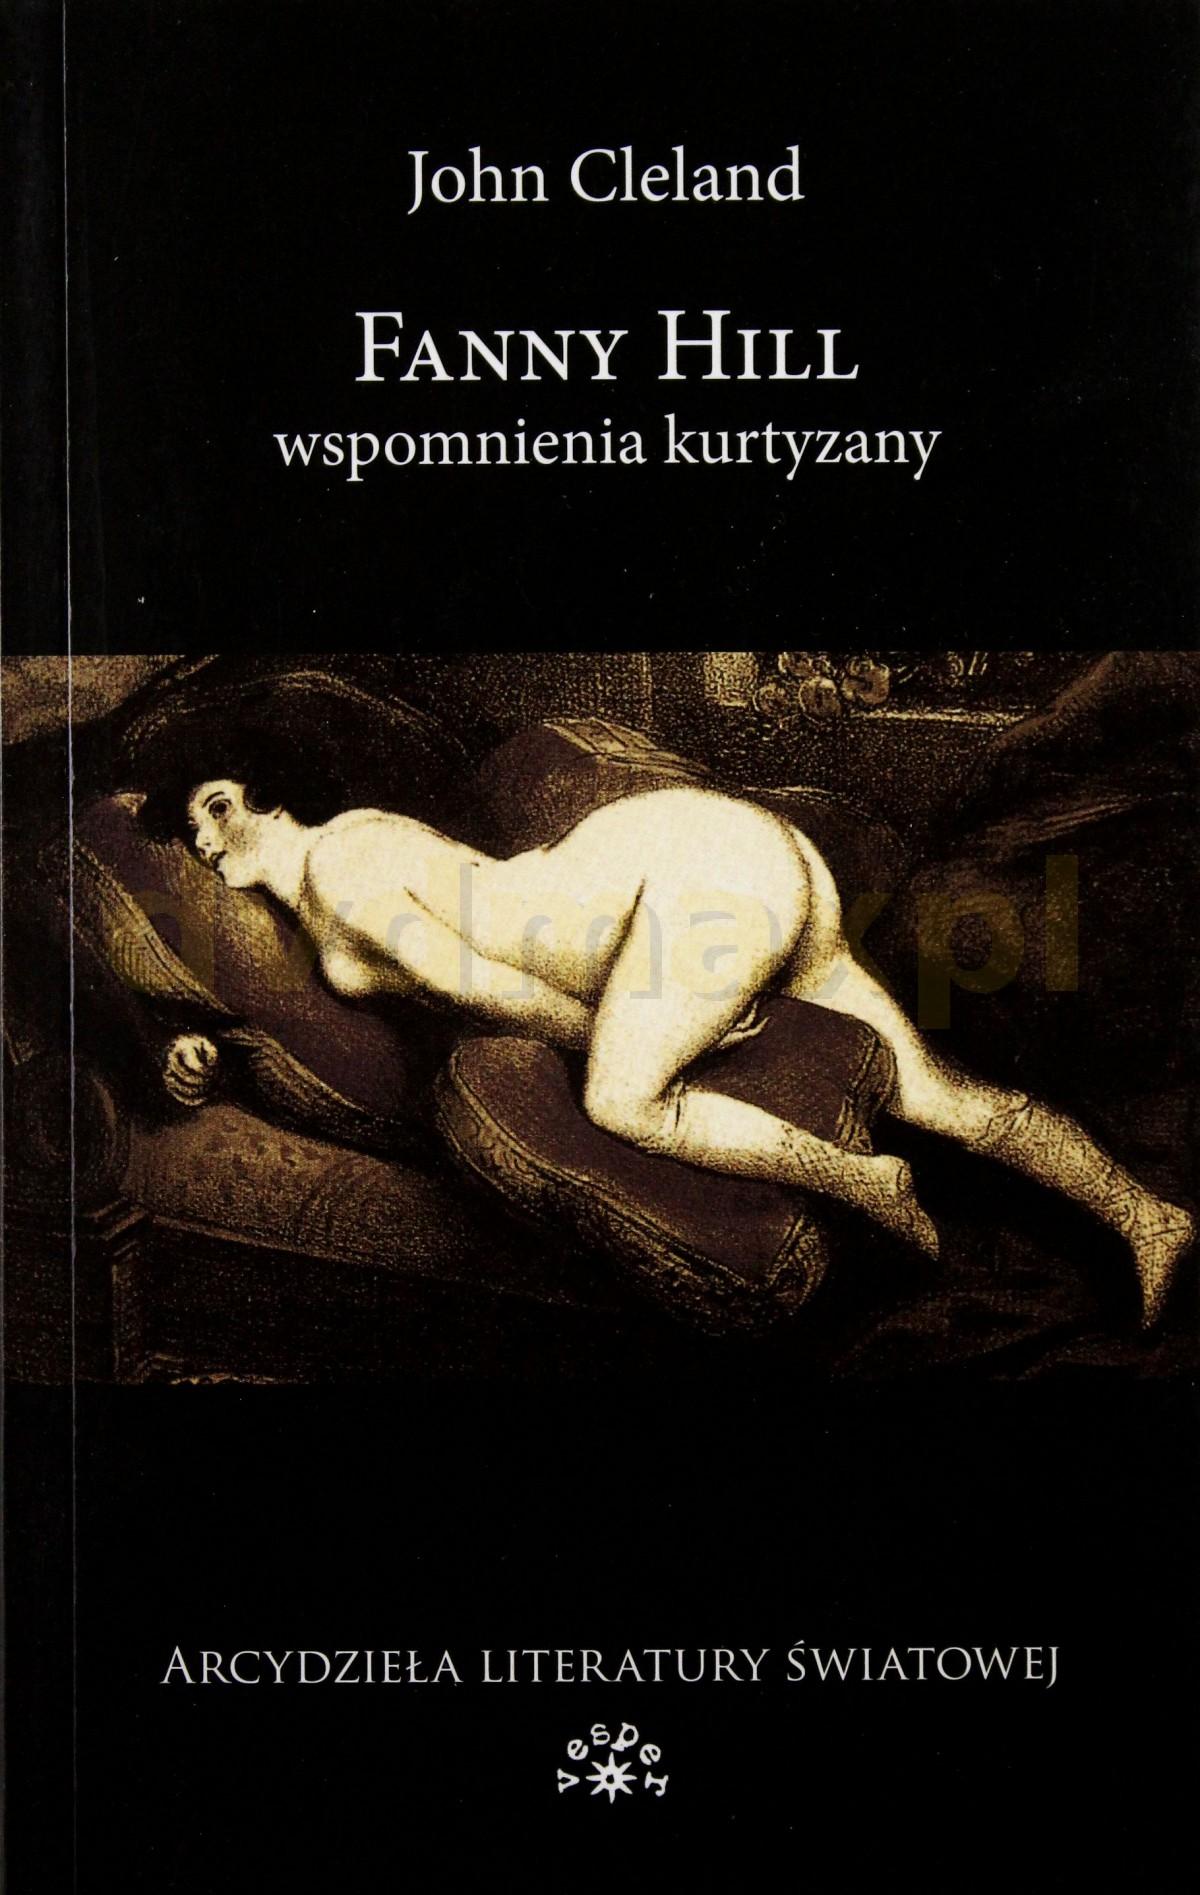 Fanny Hill. Wspomnienia kurtyzany - John Cleland [KSIĄŻKA] - John Cleland